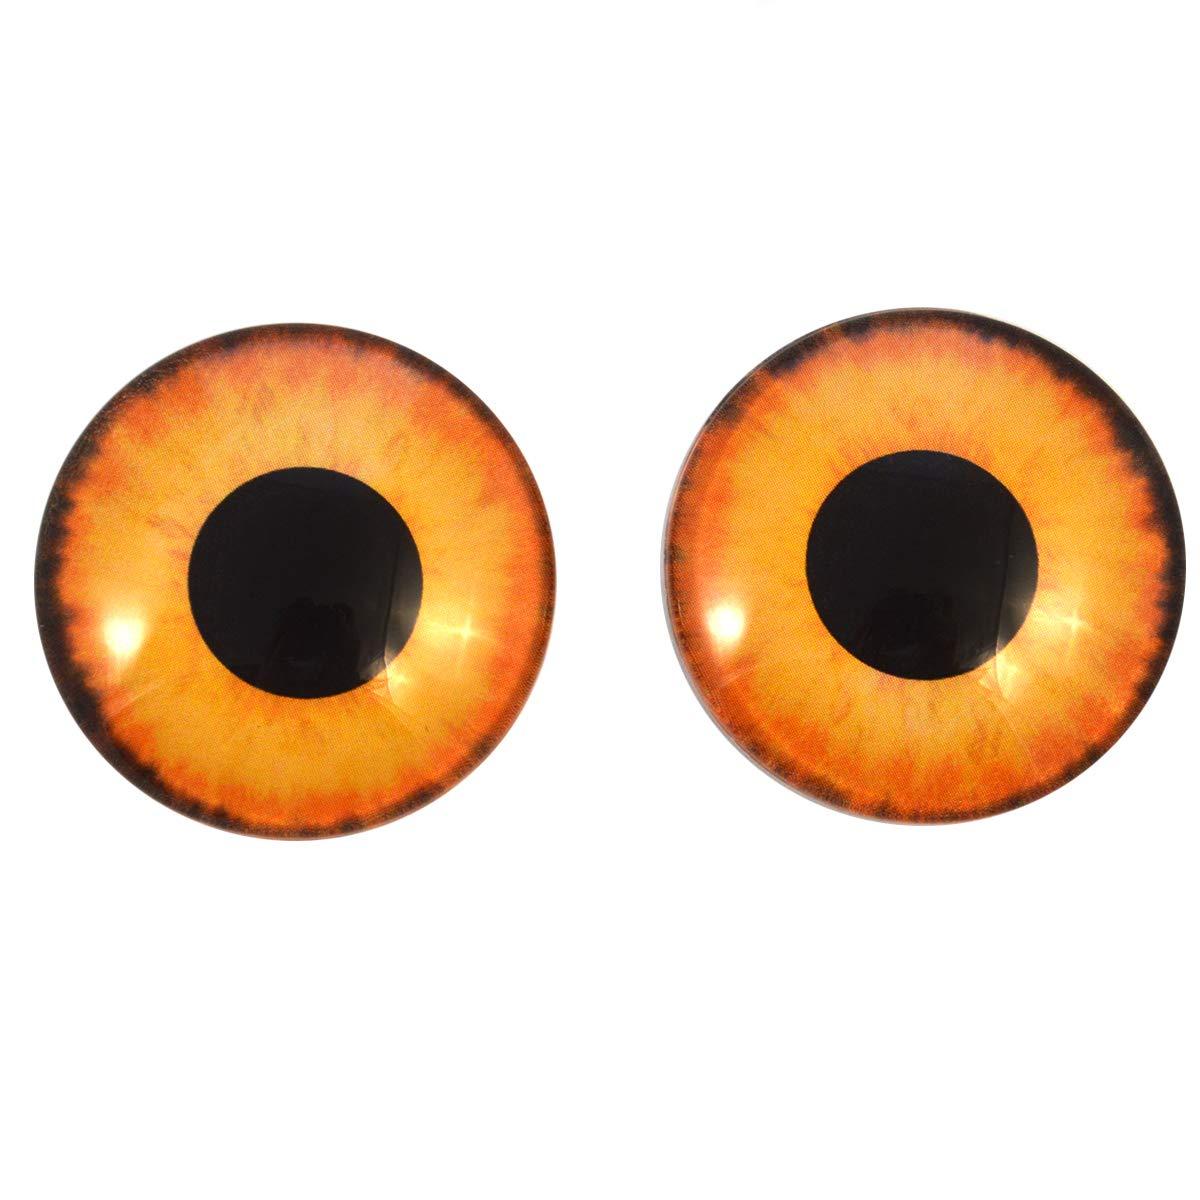 Yellow and Orange Animal Eyeballs 40mm Wild Creature Glass Eyes Cabochon Set